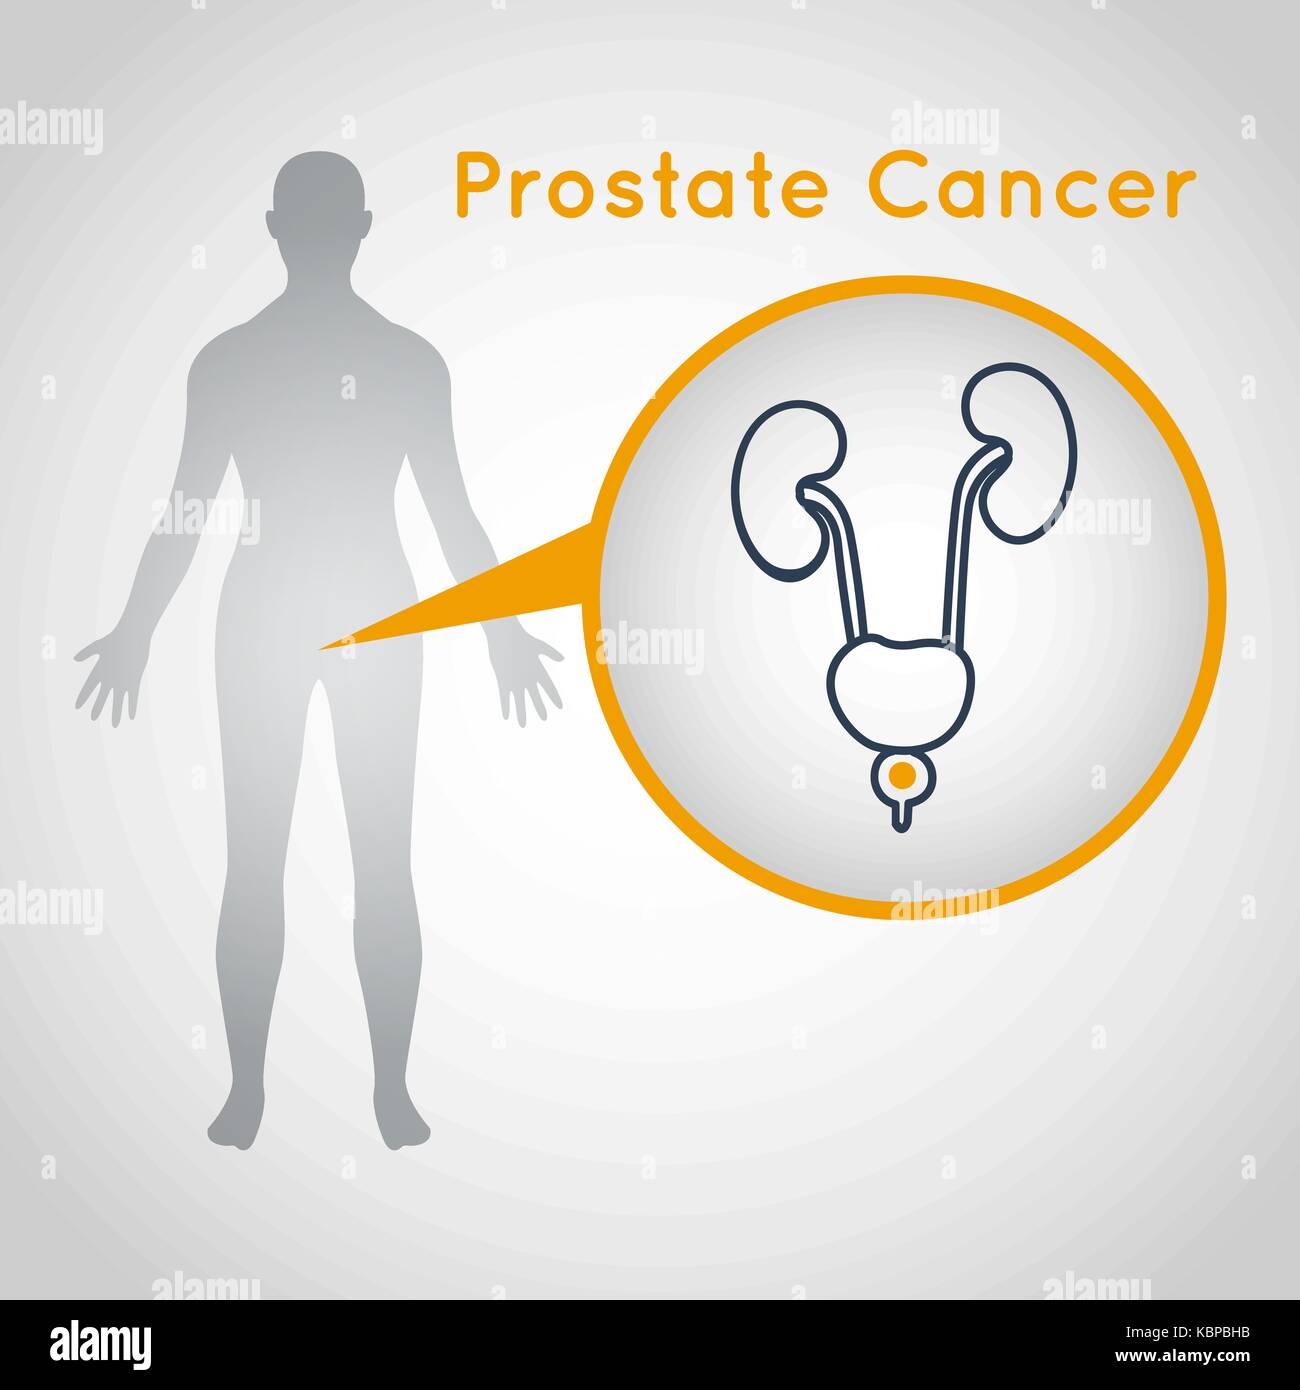 Prostate Gland Stockfotos & Prostate Gland Bilder - Alamy